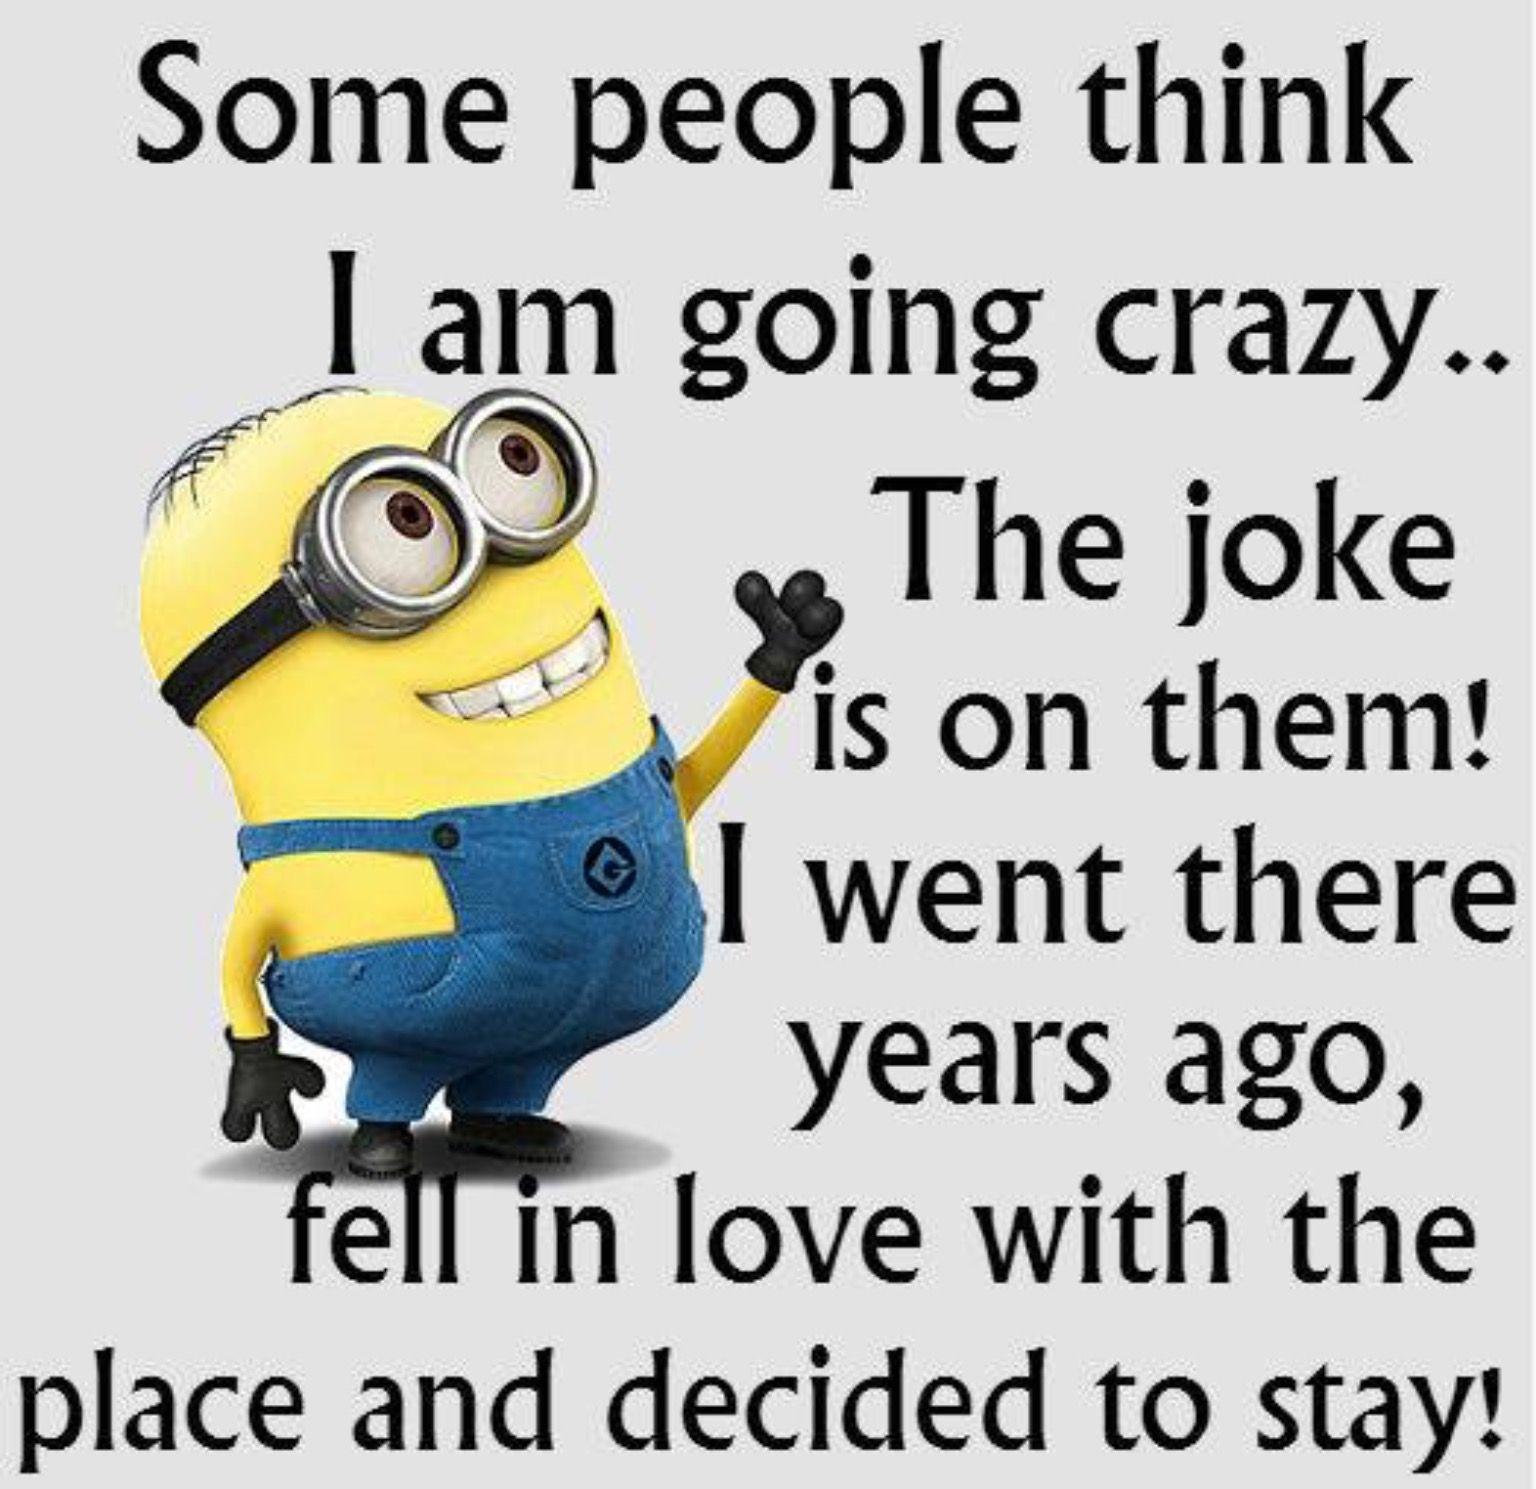 Pin By Jeepdriversus On Funny Stuff Minions Funny Funny Minion Quotes Minions Quotes